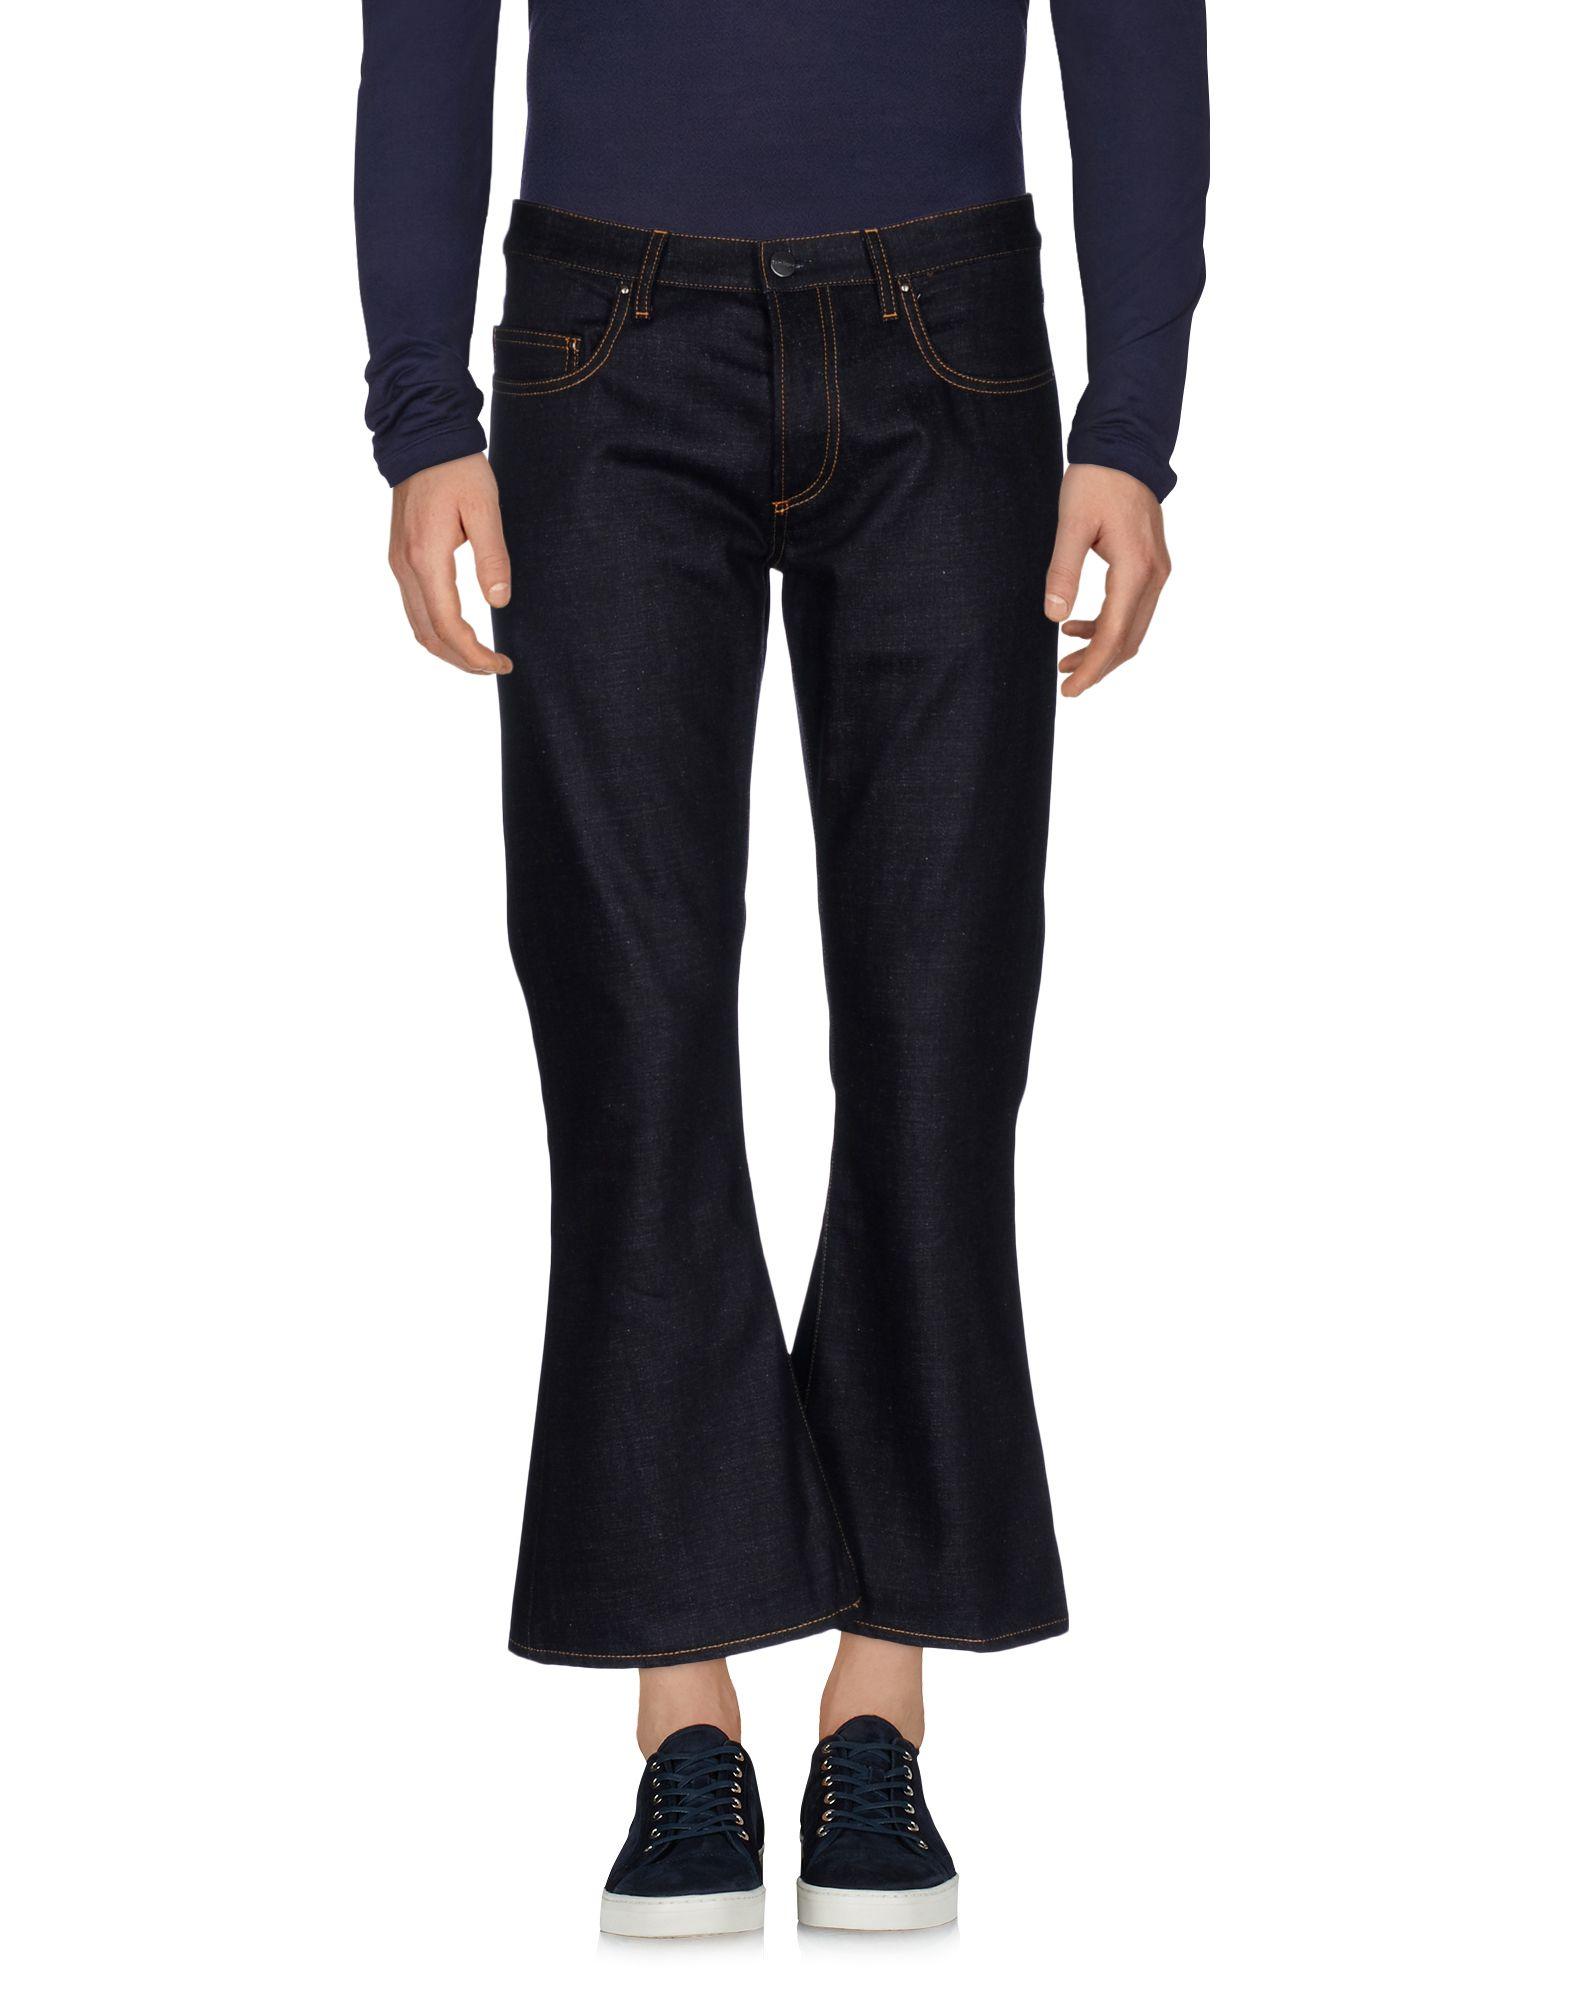 Pantaloni Jeans Palm Angels Uomo - Acquista online su